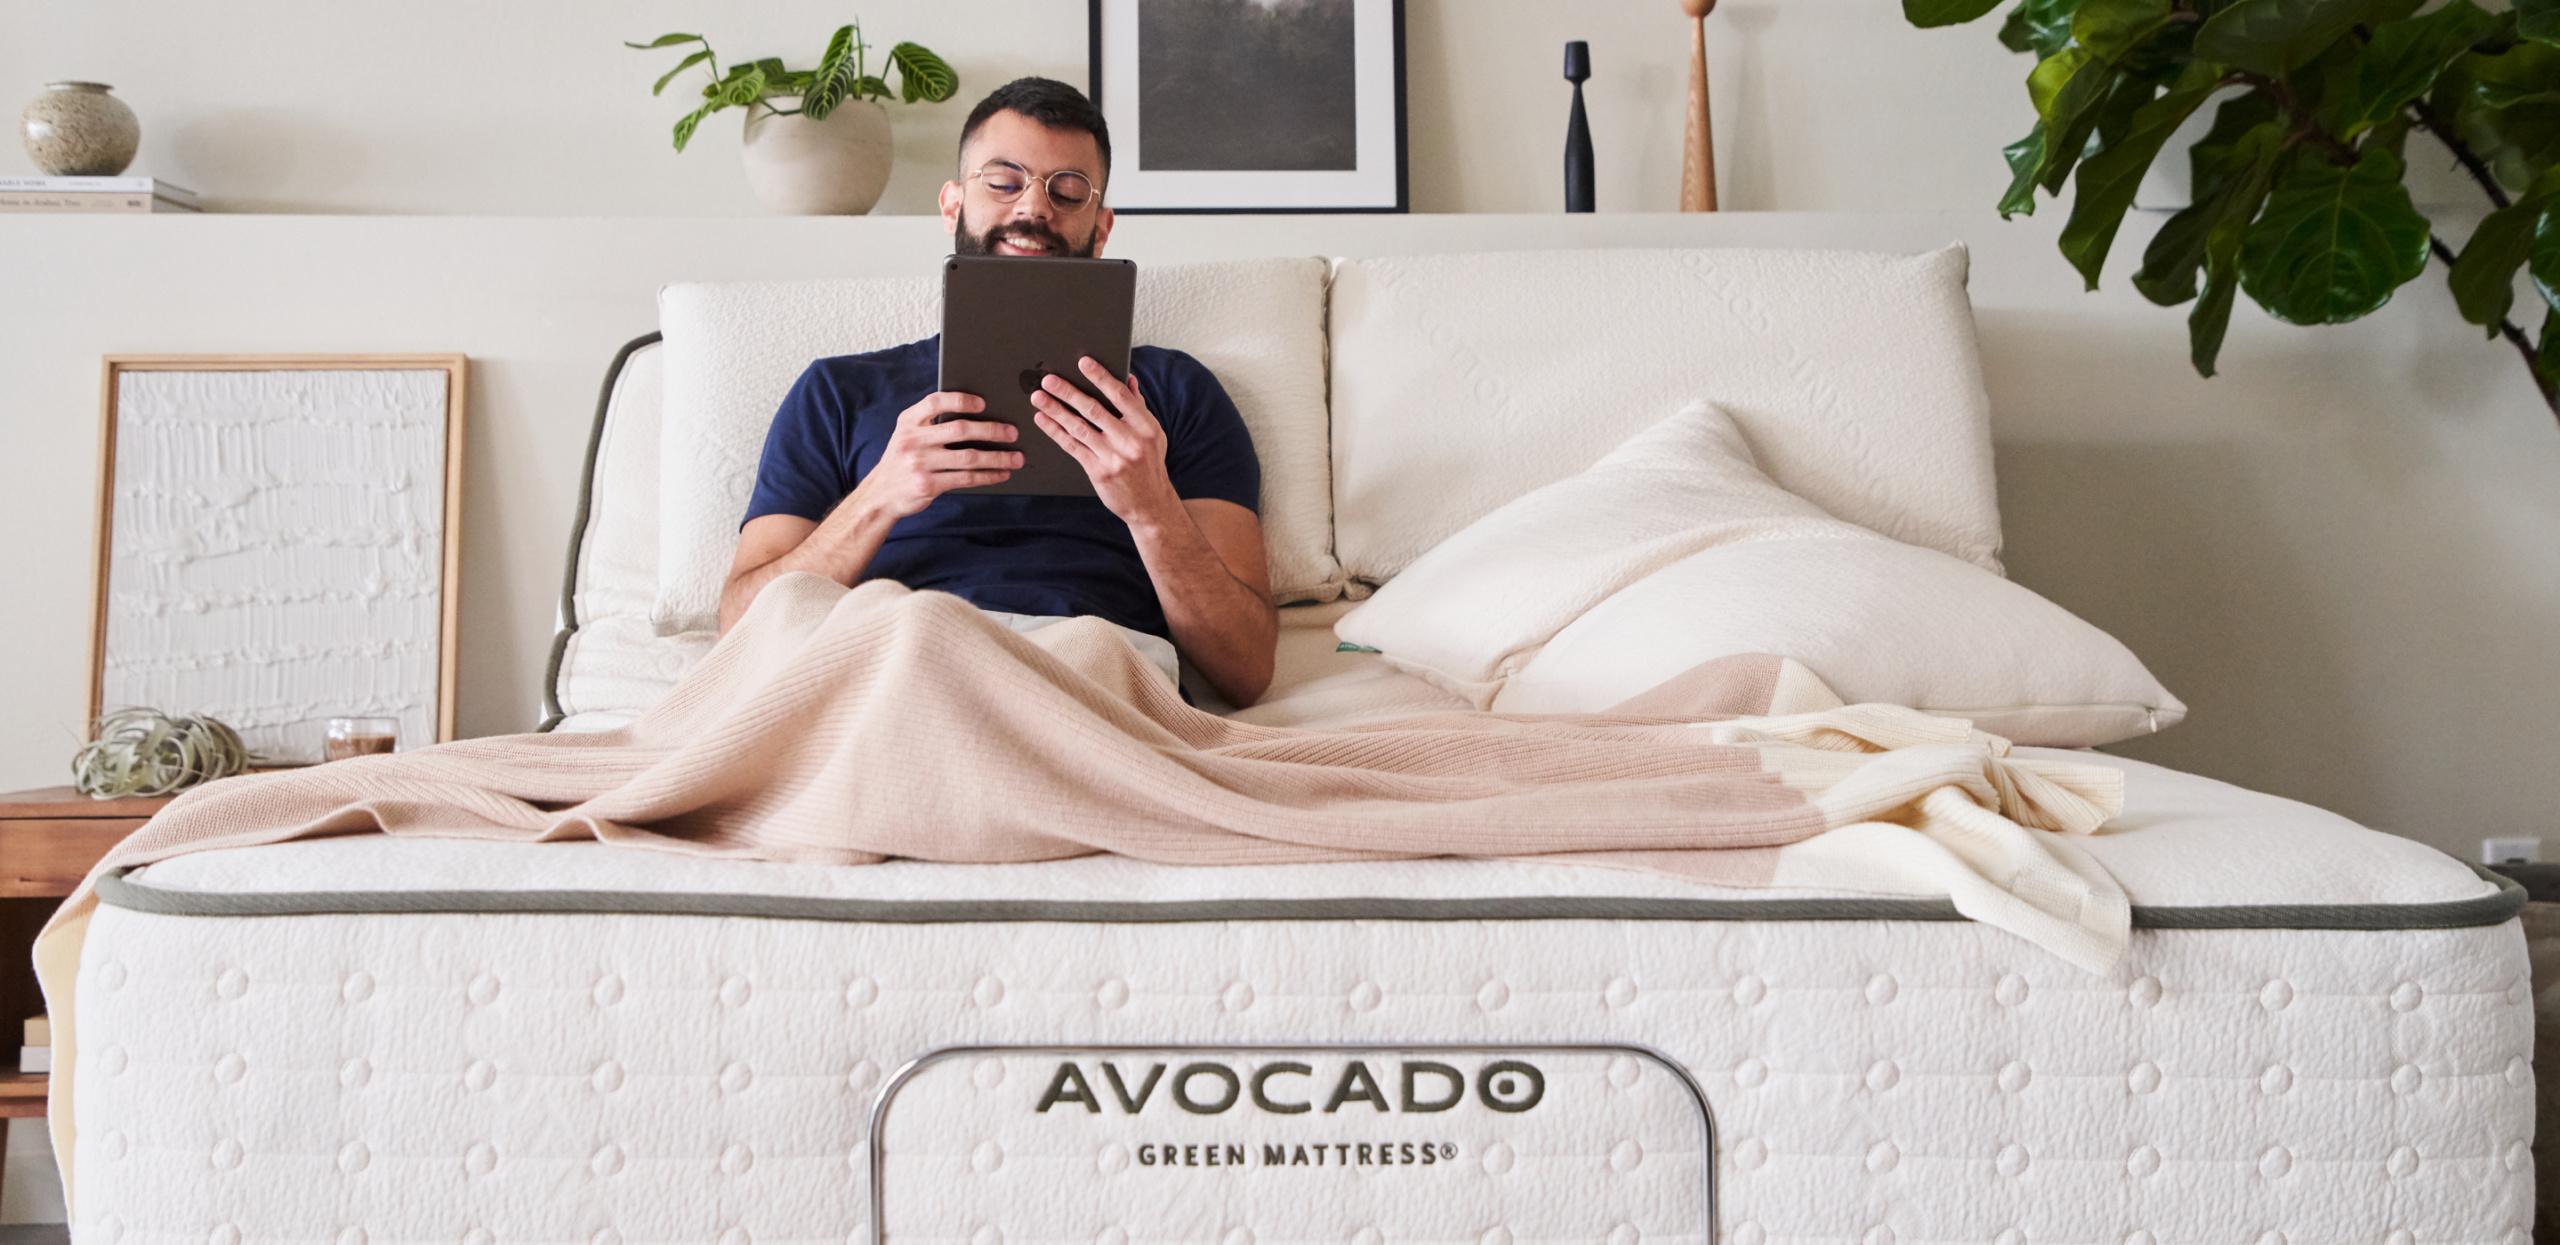 adjustable base from the avocado mattress company